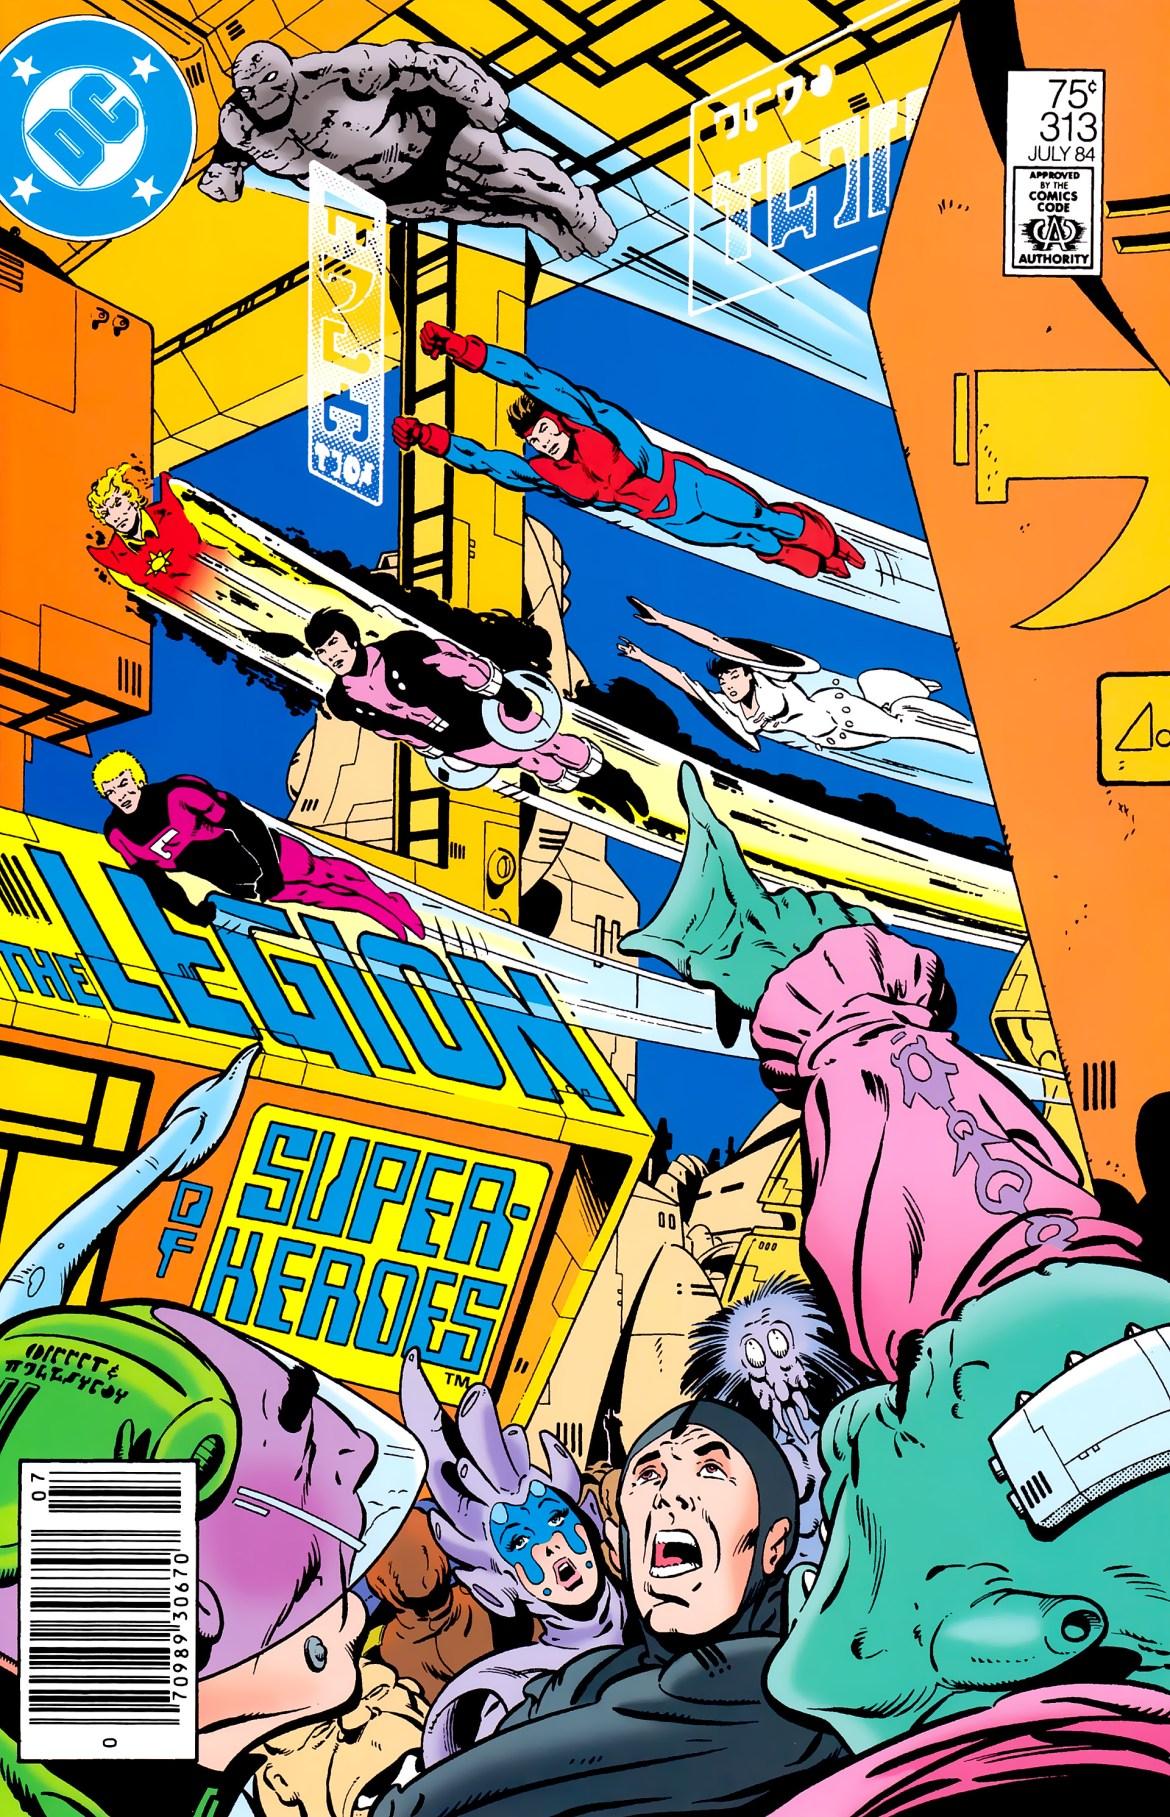 Reviews Of Old Comics: Legion Of Super-Heroes #313